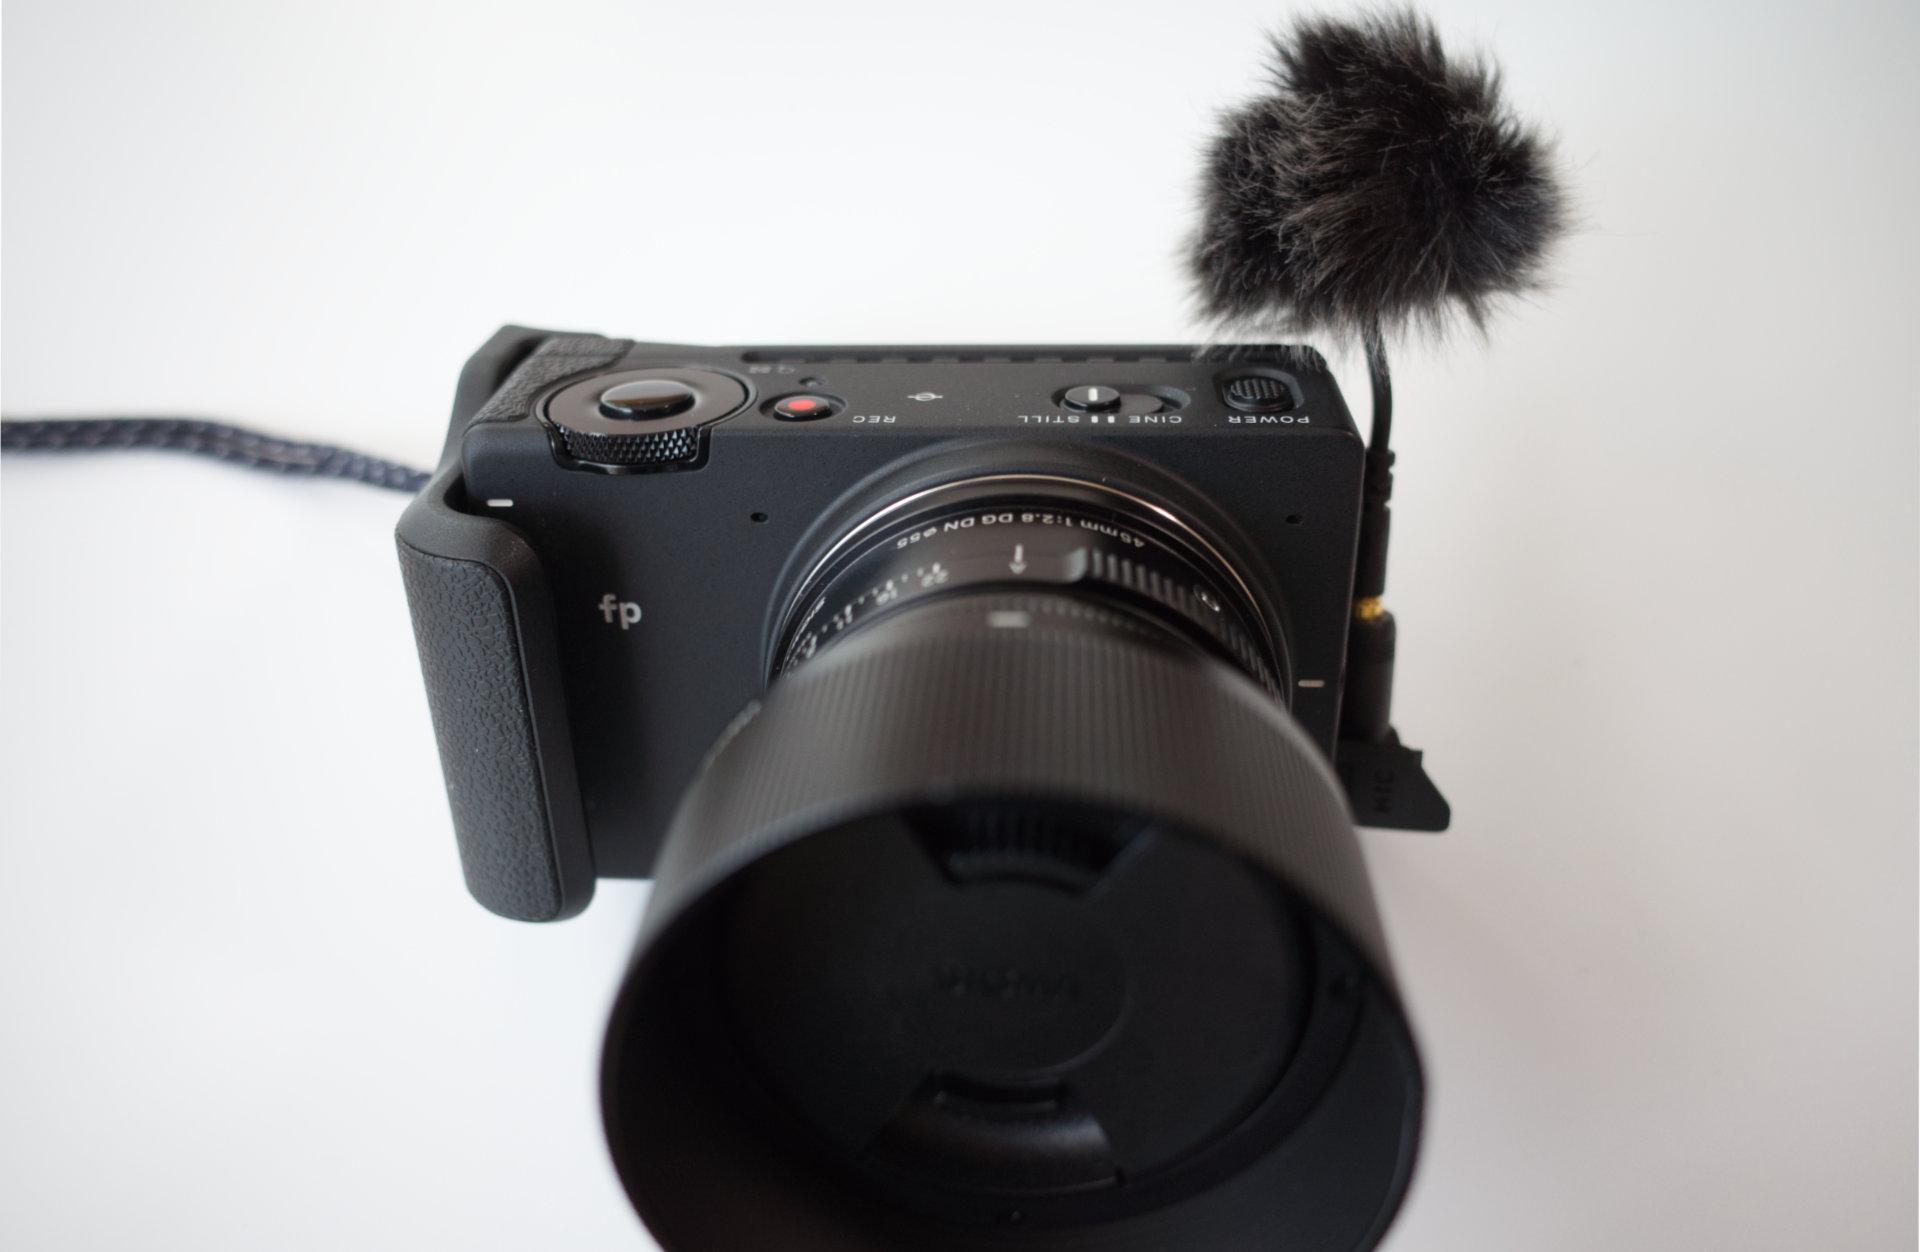 SIGMA fpにDJI OSMO - DJI FM-15フレキシブルマイクロフォン(ウィンドジャマーによる風音対策)を取り付け